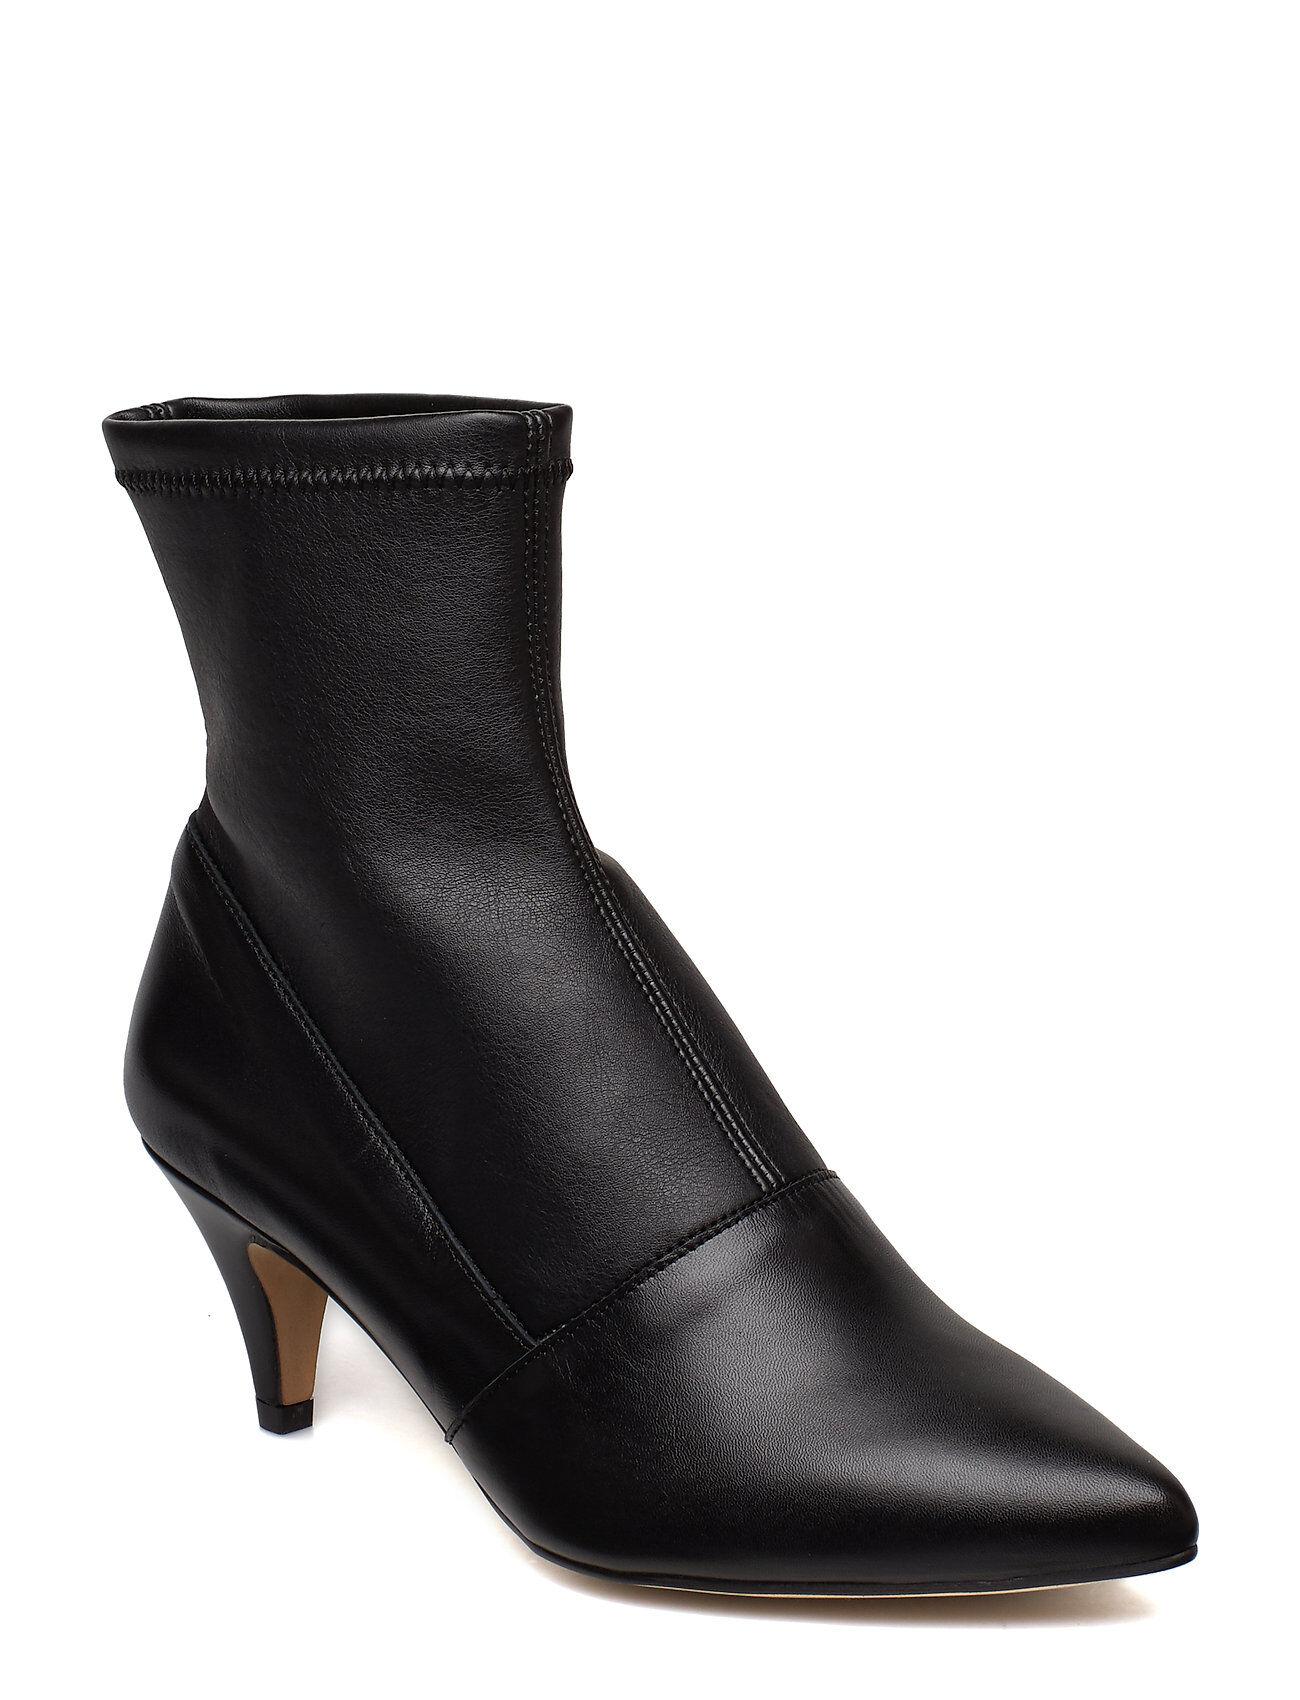 Henry Kole Emma Leather Black Shoes Boots Ankle Boots Ankle Boots With Heel Musta Henry Kole